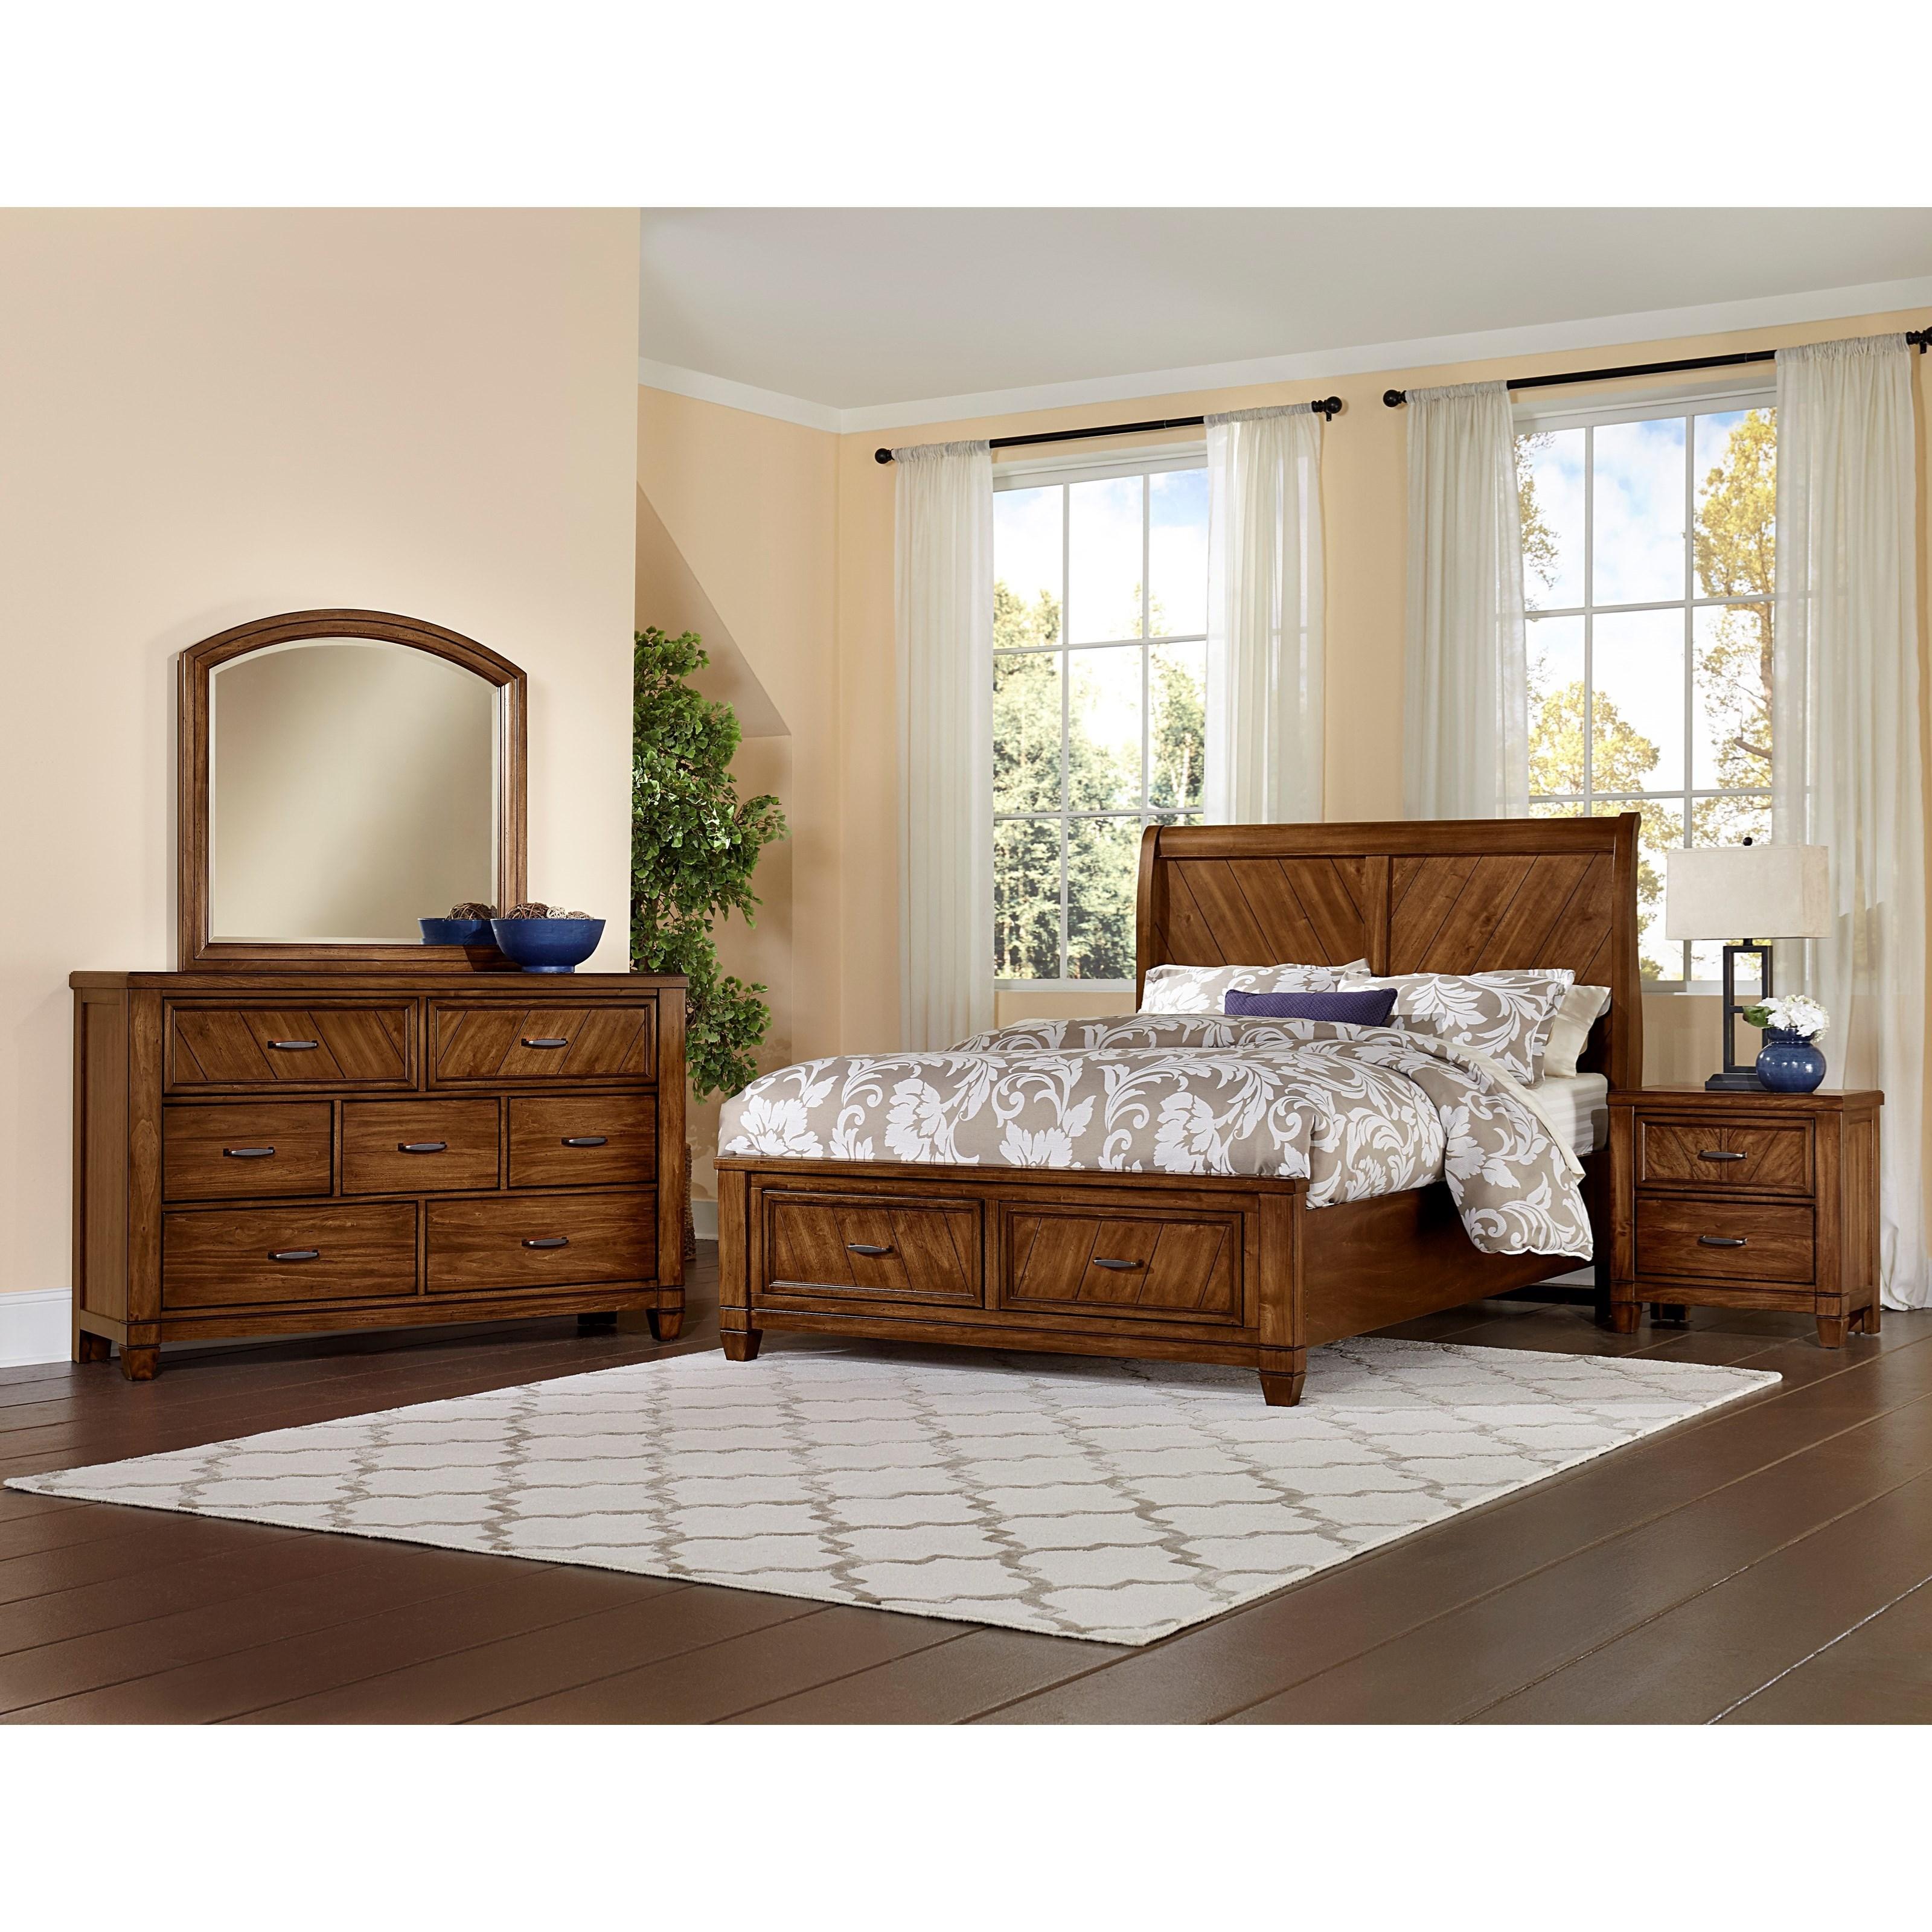 Vaughan bassett rustic cottage queen bedroom group dunk - Bright house bedroom furniture ...